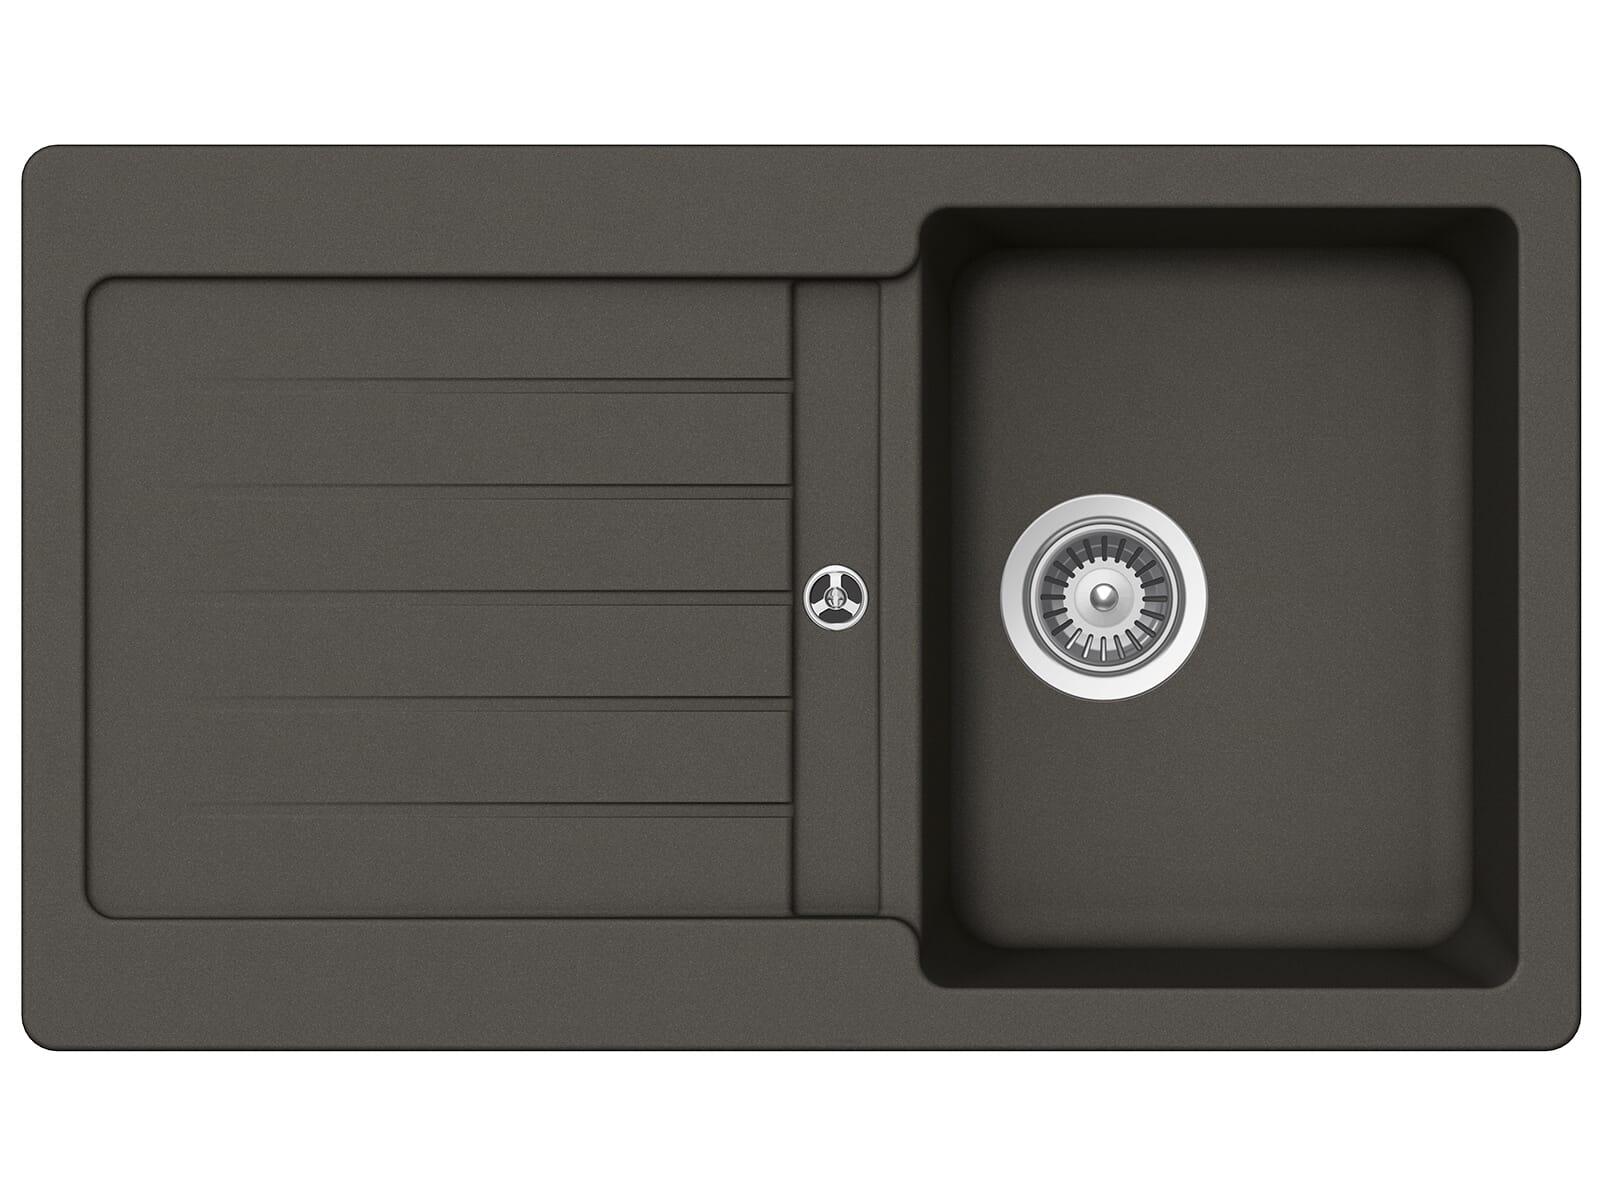 Schock Typos D-100 A Asphalt - TYPD100AGAS Granitspüle